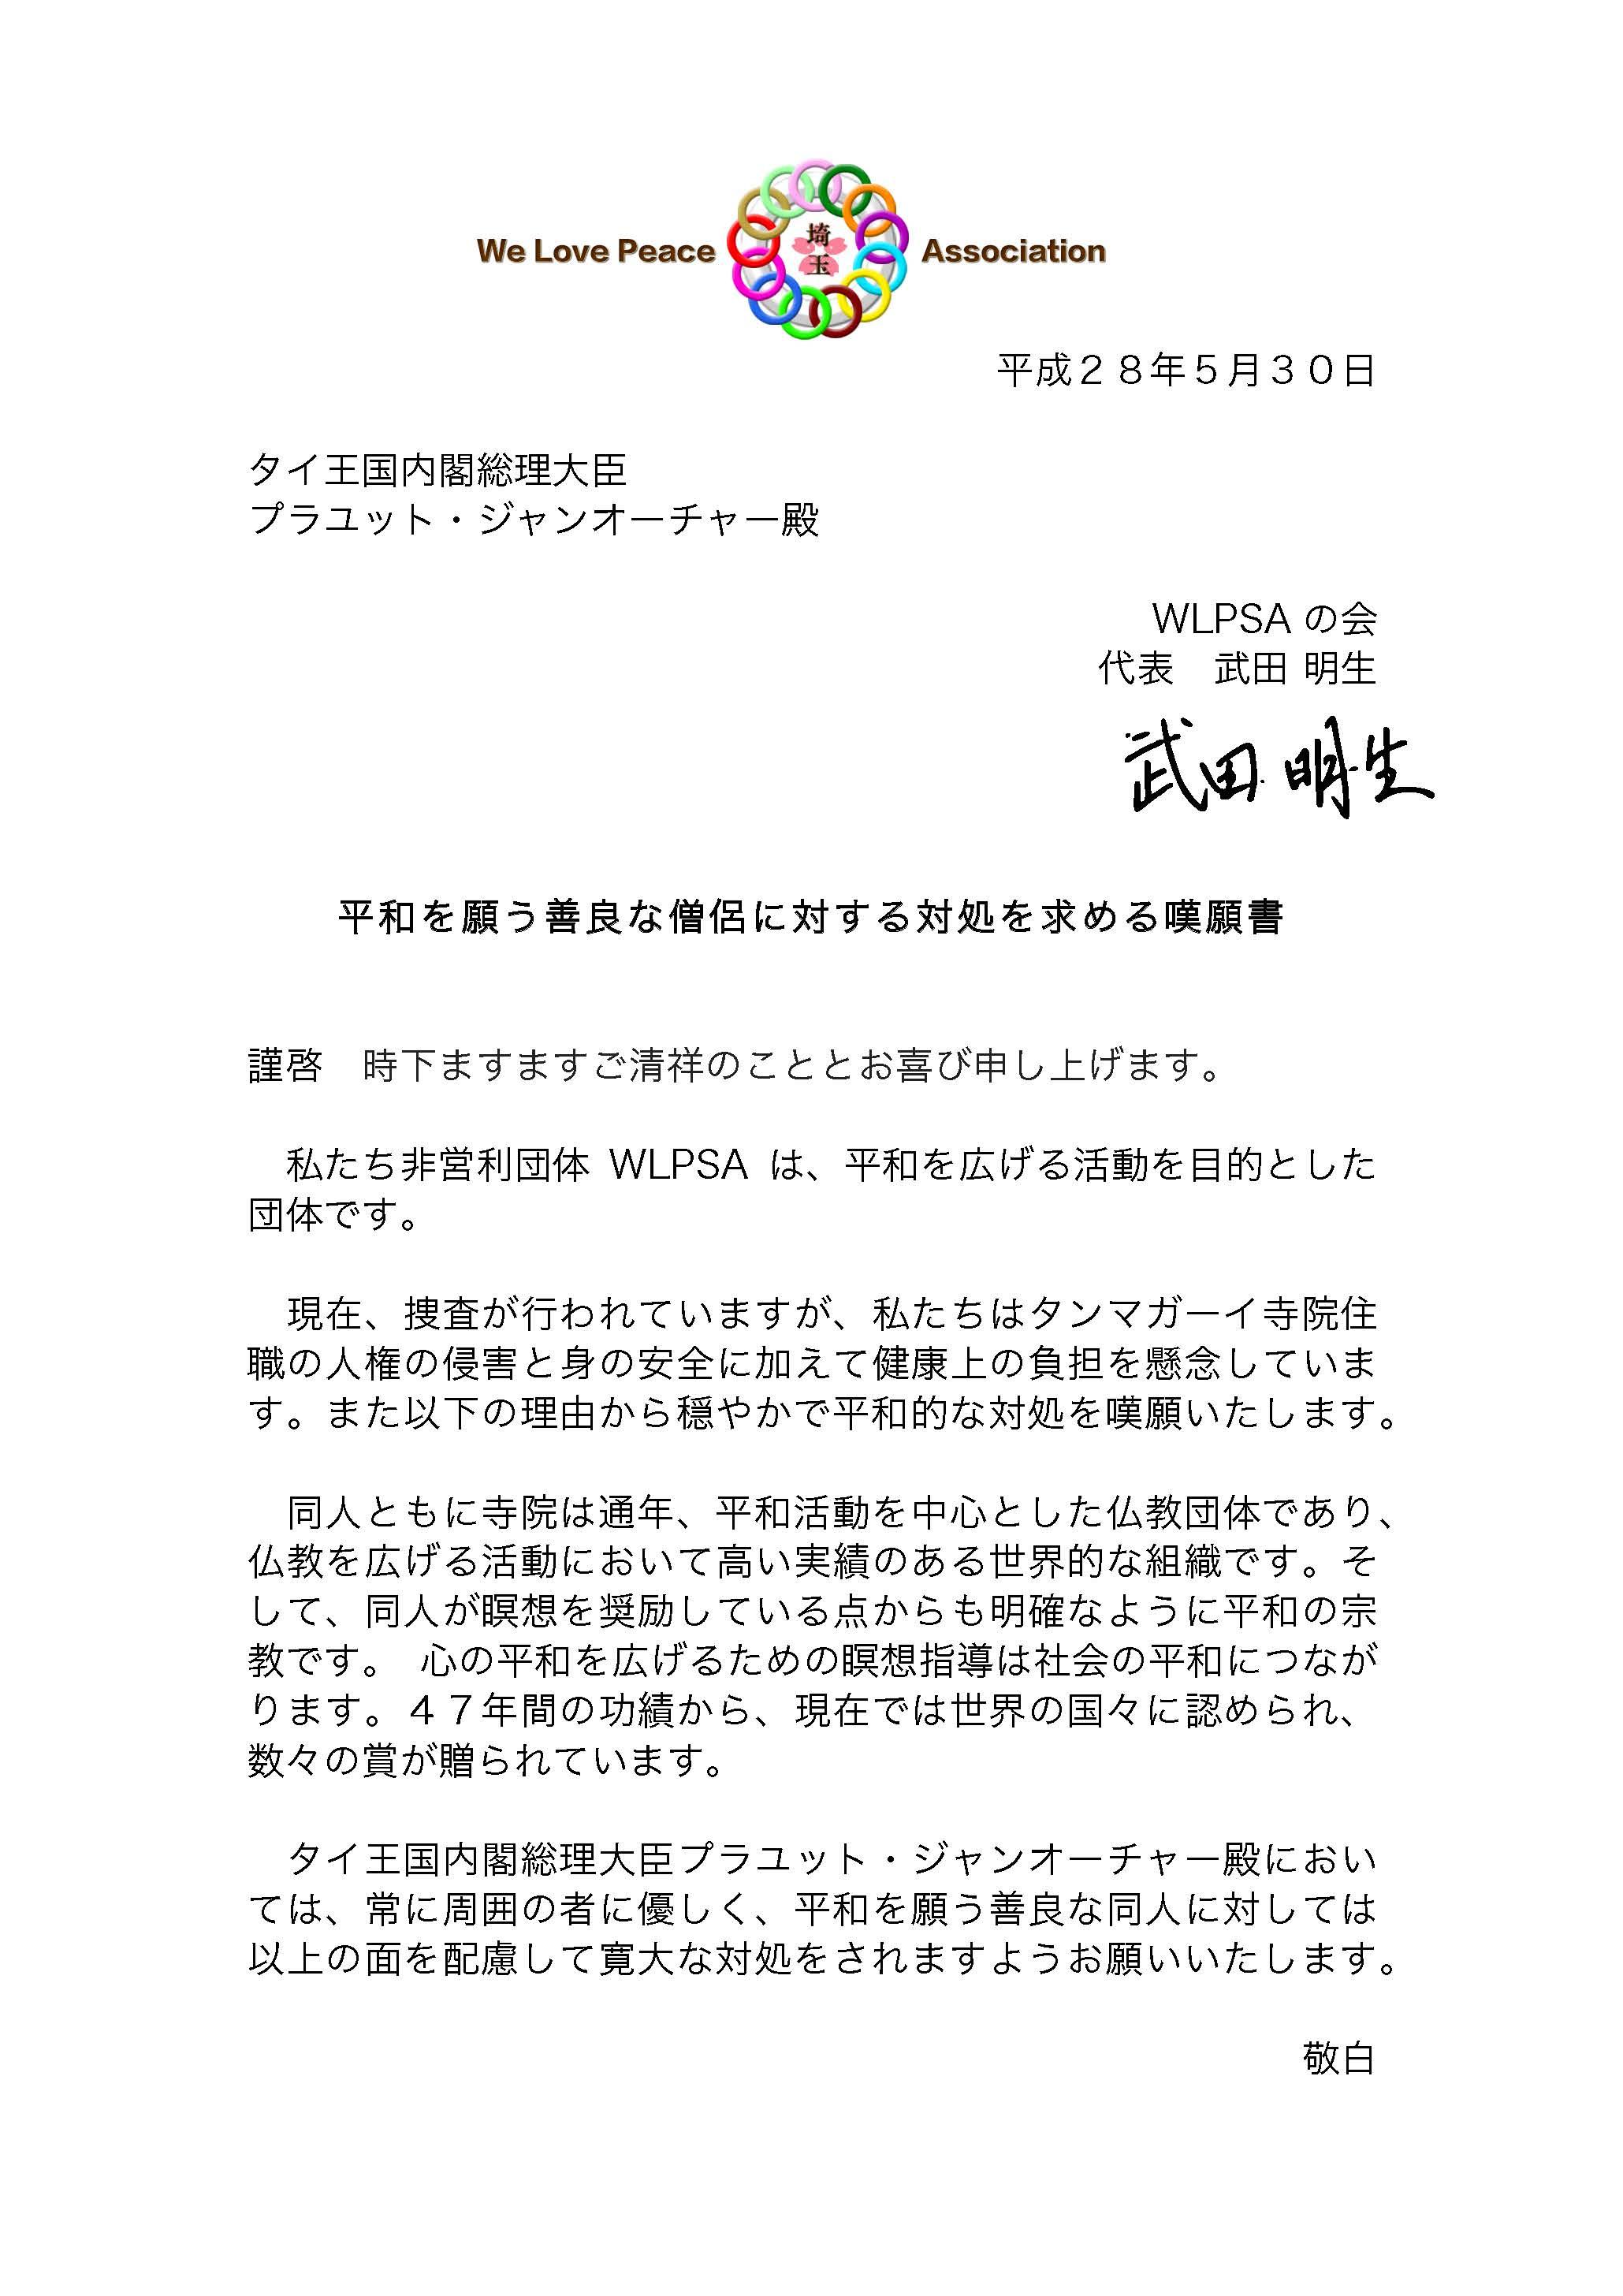 602572_Saitama_Page_1.jpg